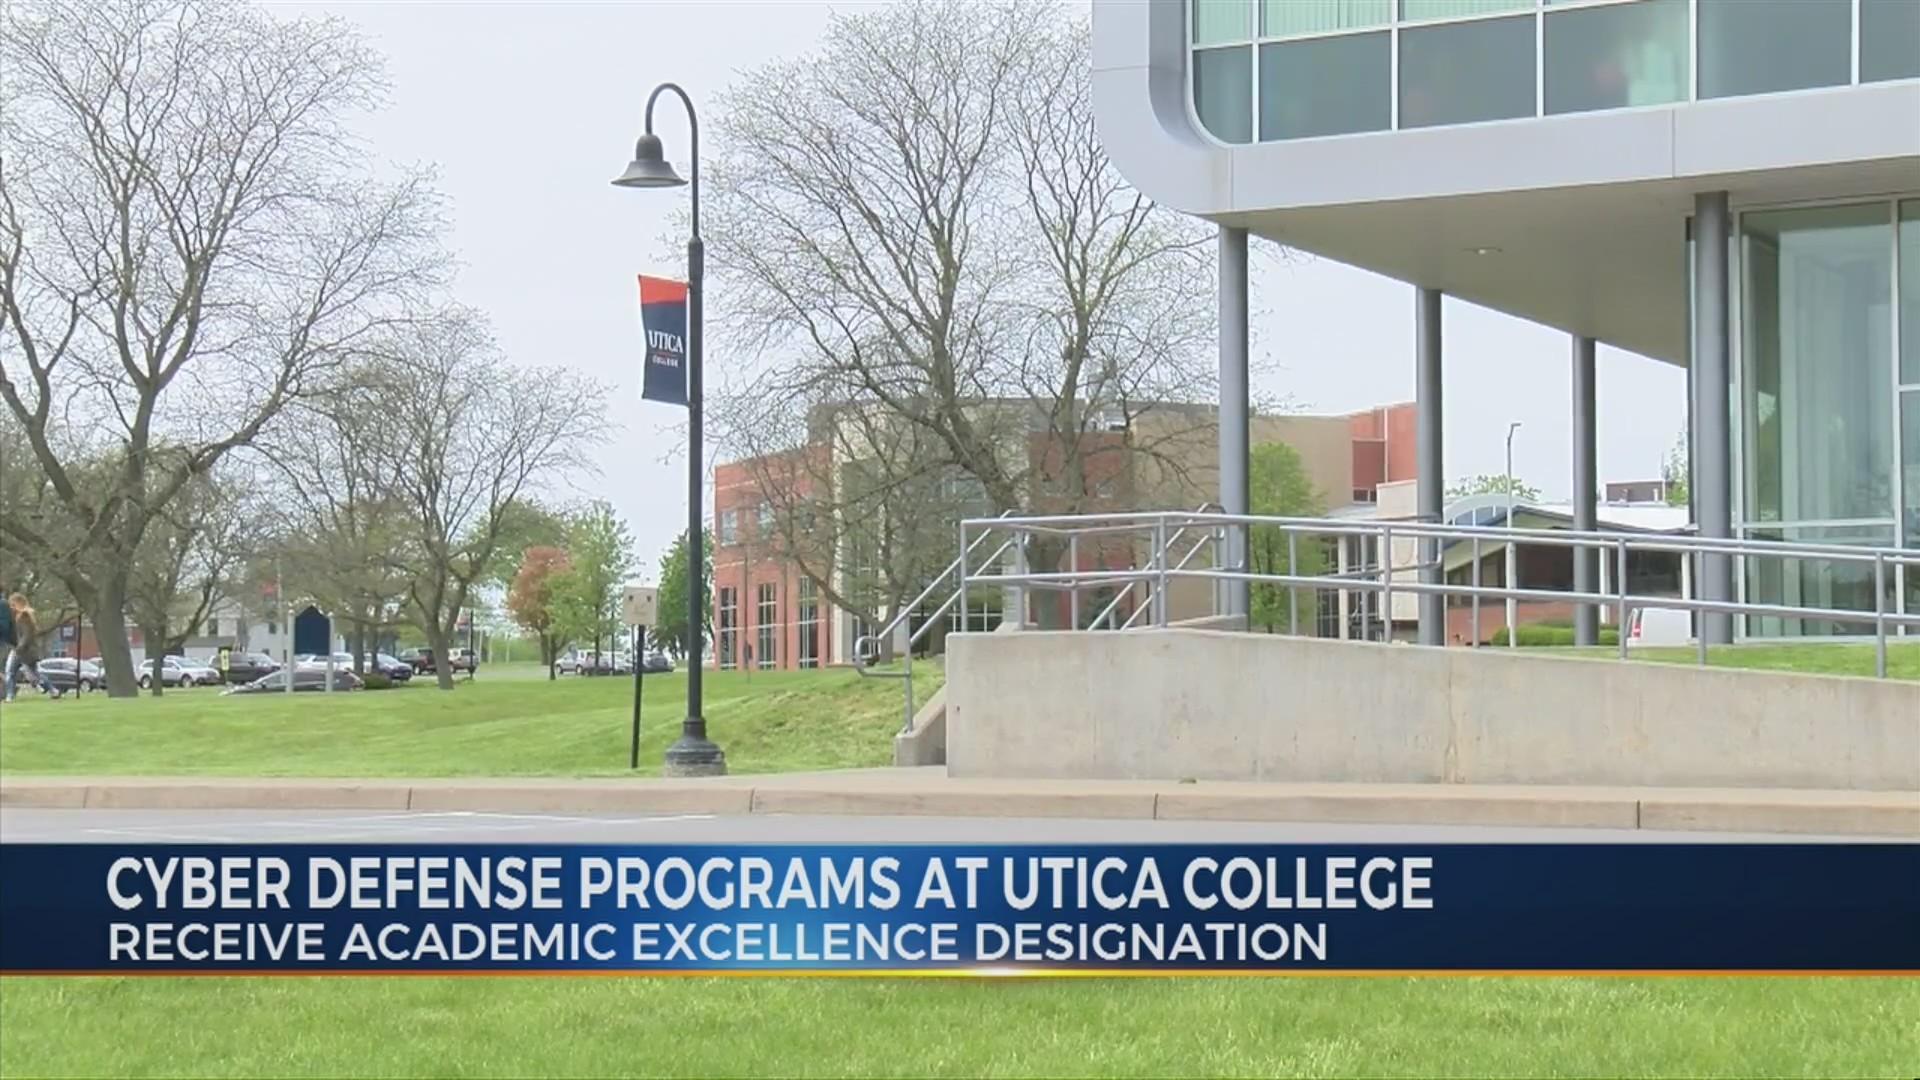 Cyber Defense Programs At Utica College